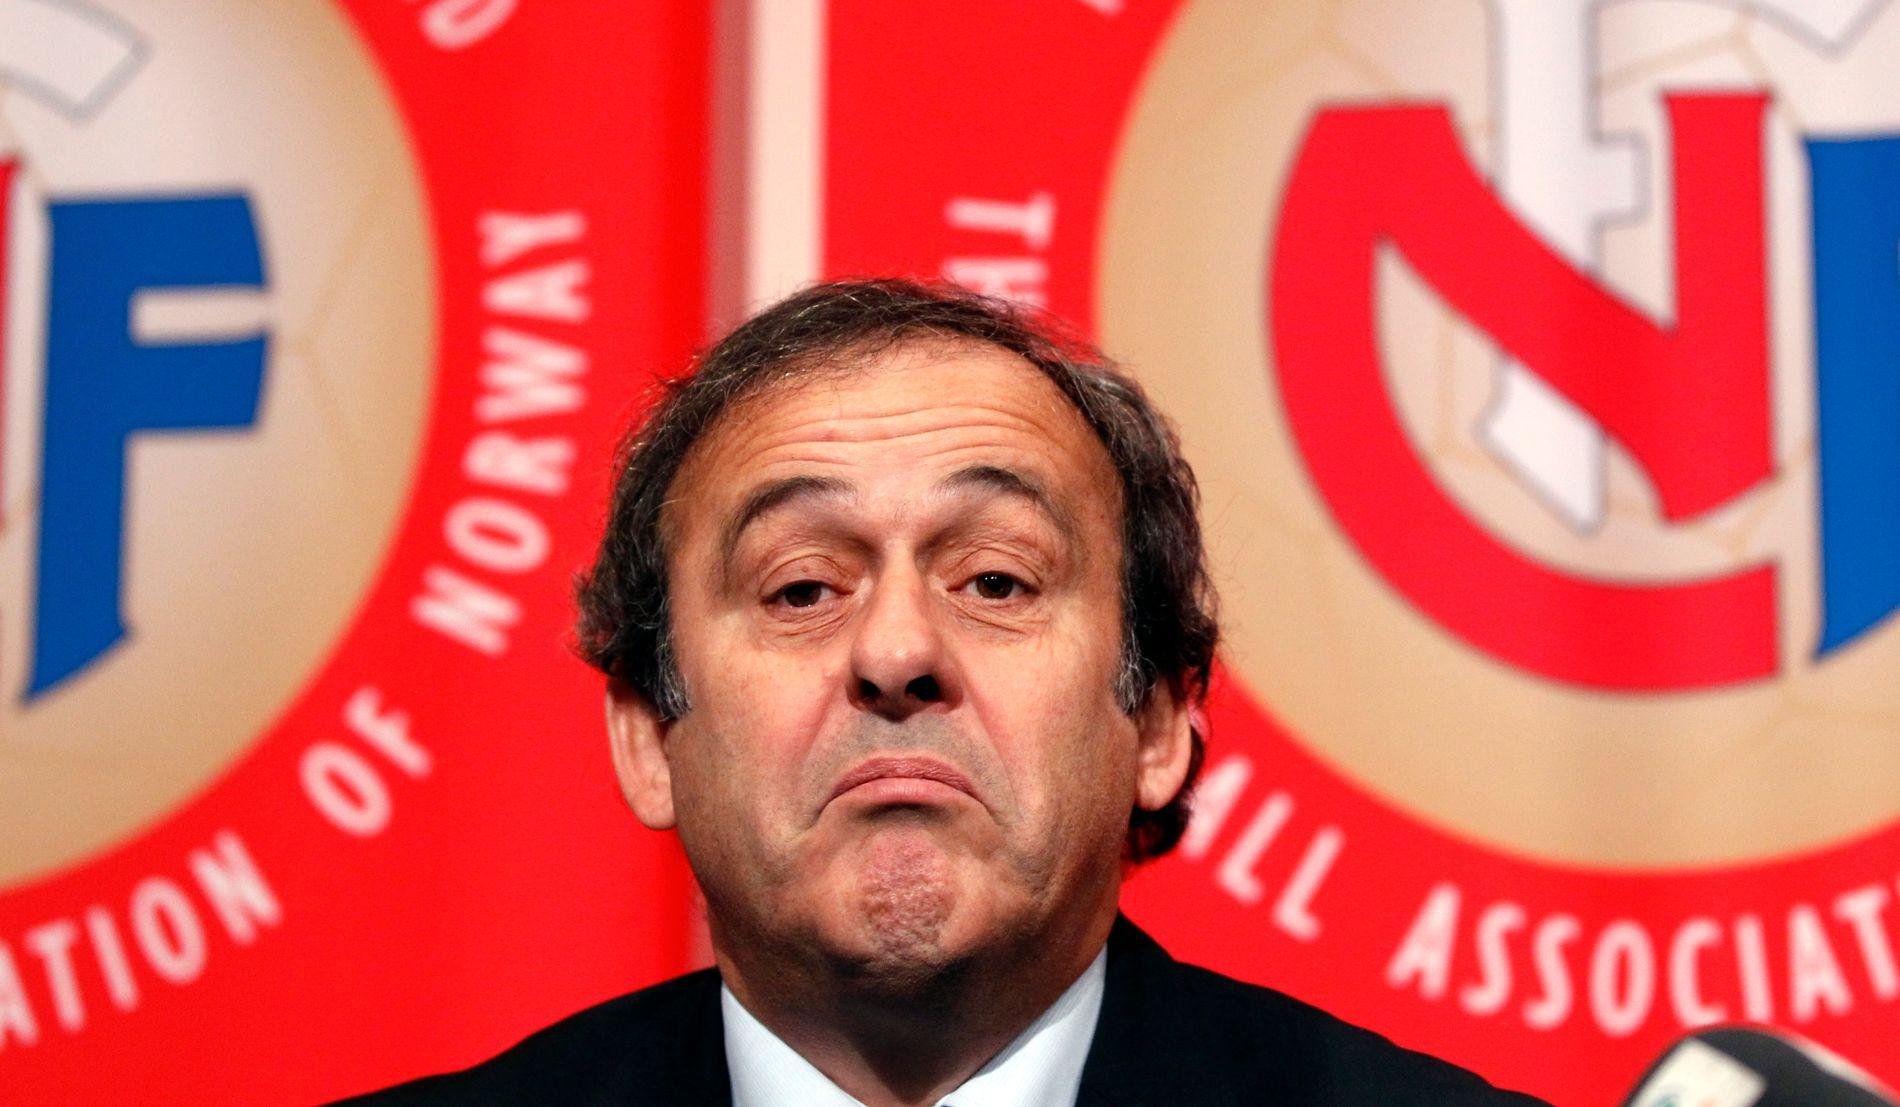 Michel Platini på besøk i Oslo da han var UEFA-president.